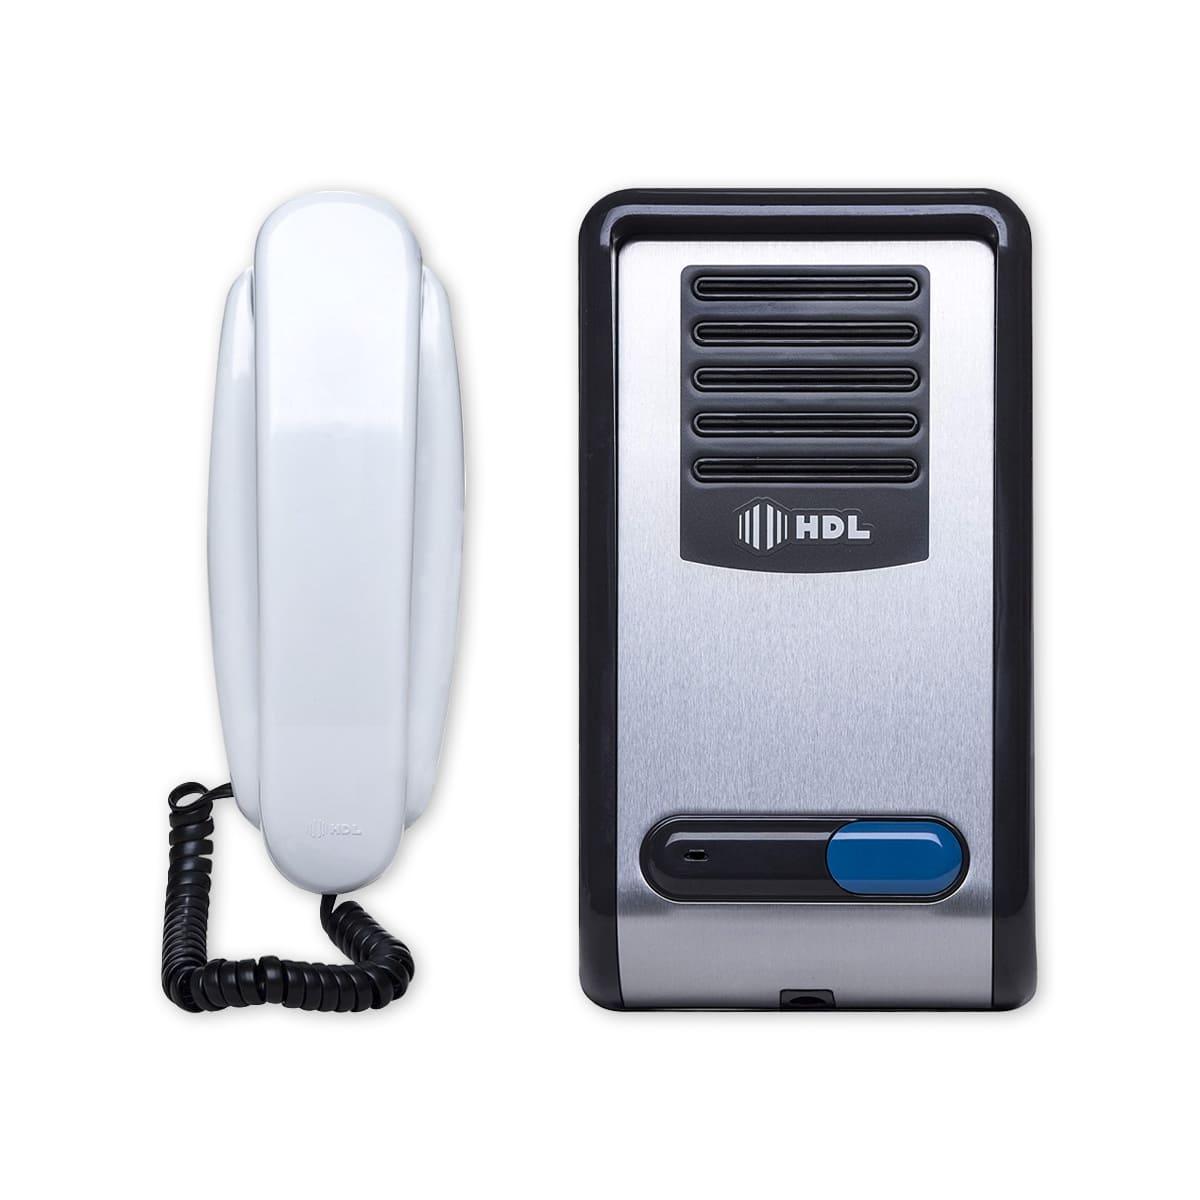 Interfone Porteiro Eletrônico F8 S NTL HDL